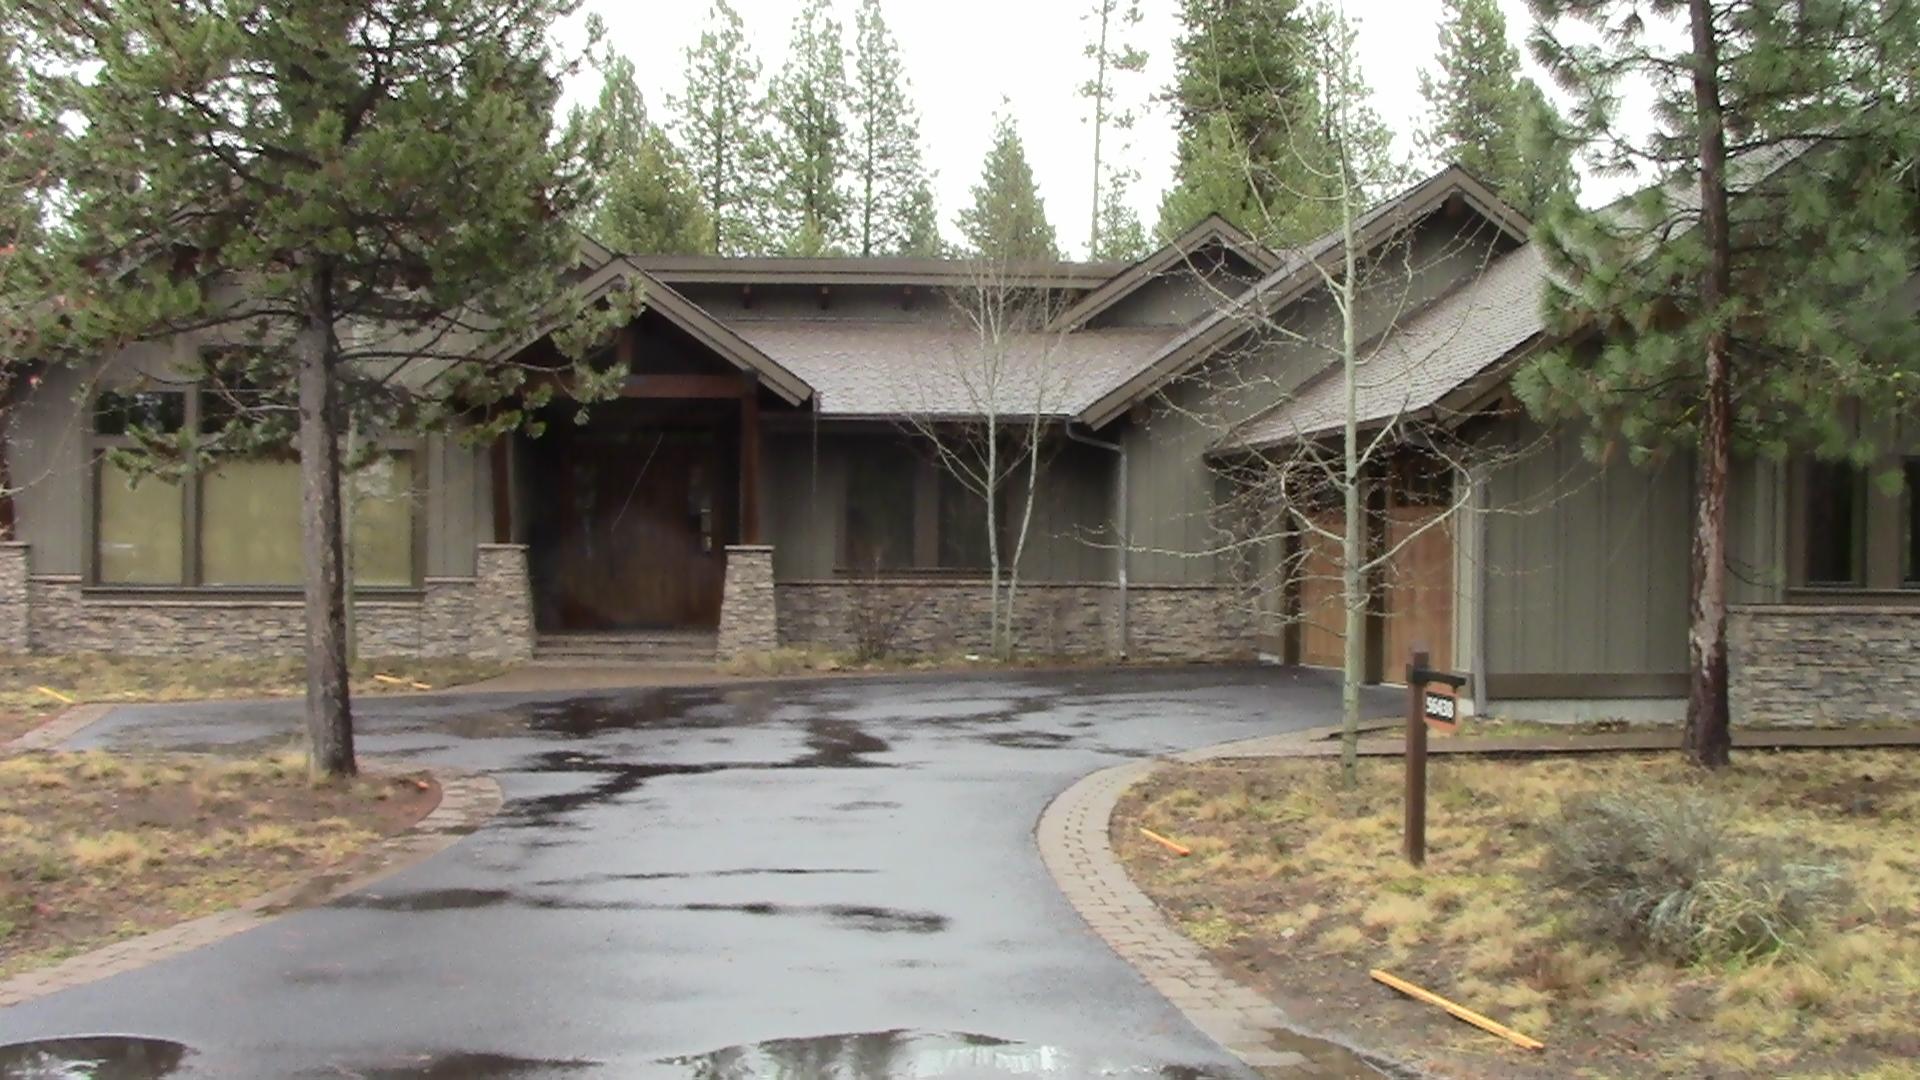 Ken Baune Homes and Remodel image 1